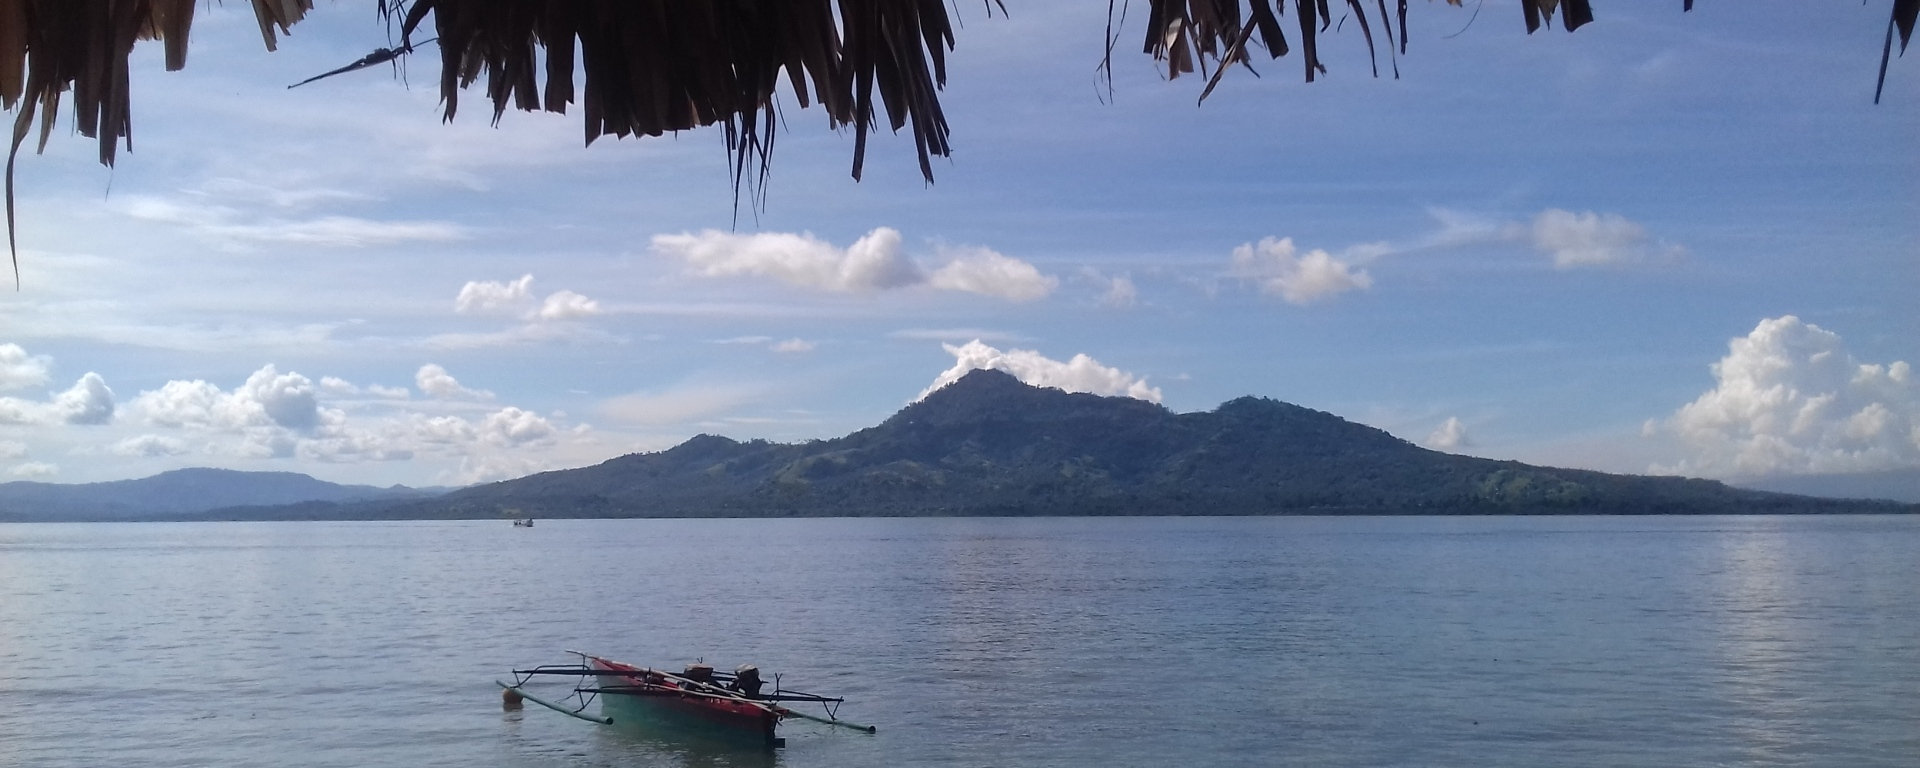 bunaken, manado, sulawesi, indonesia